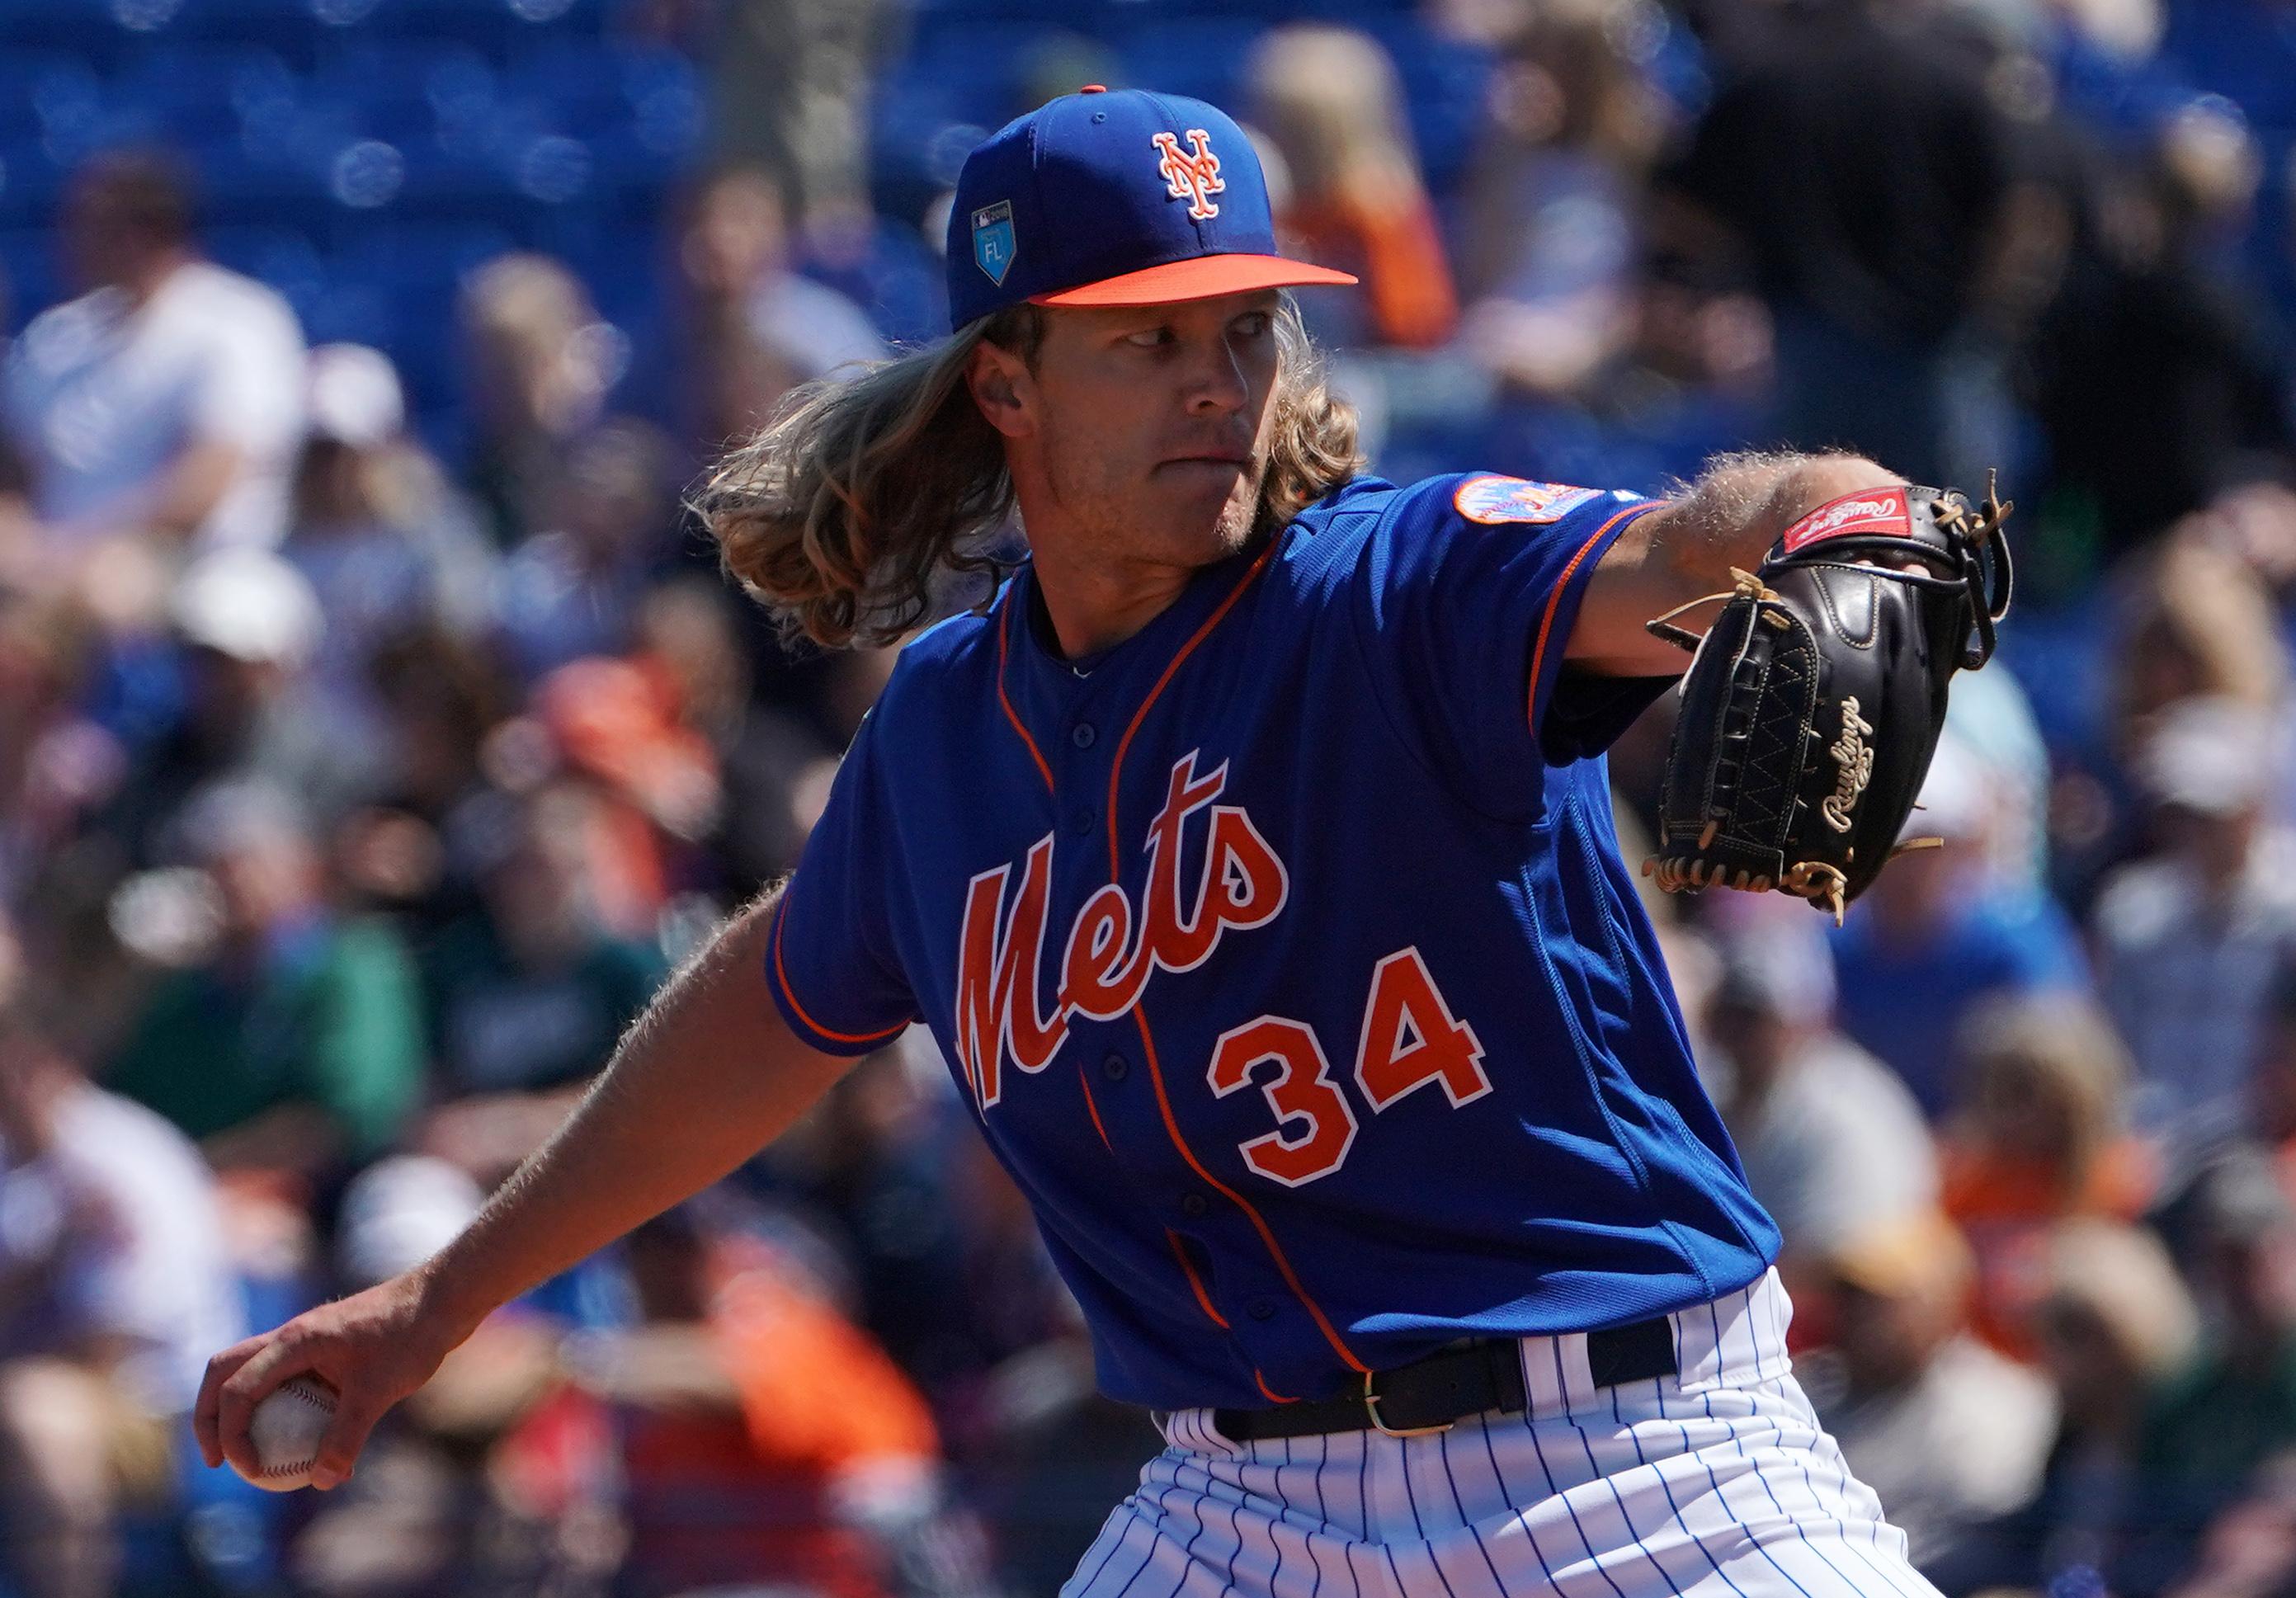 Noah Syndergaard Goes Seven Strong In New York Mets' Win